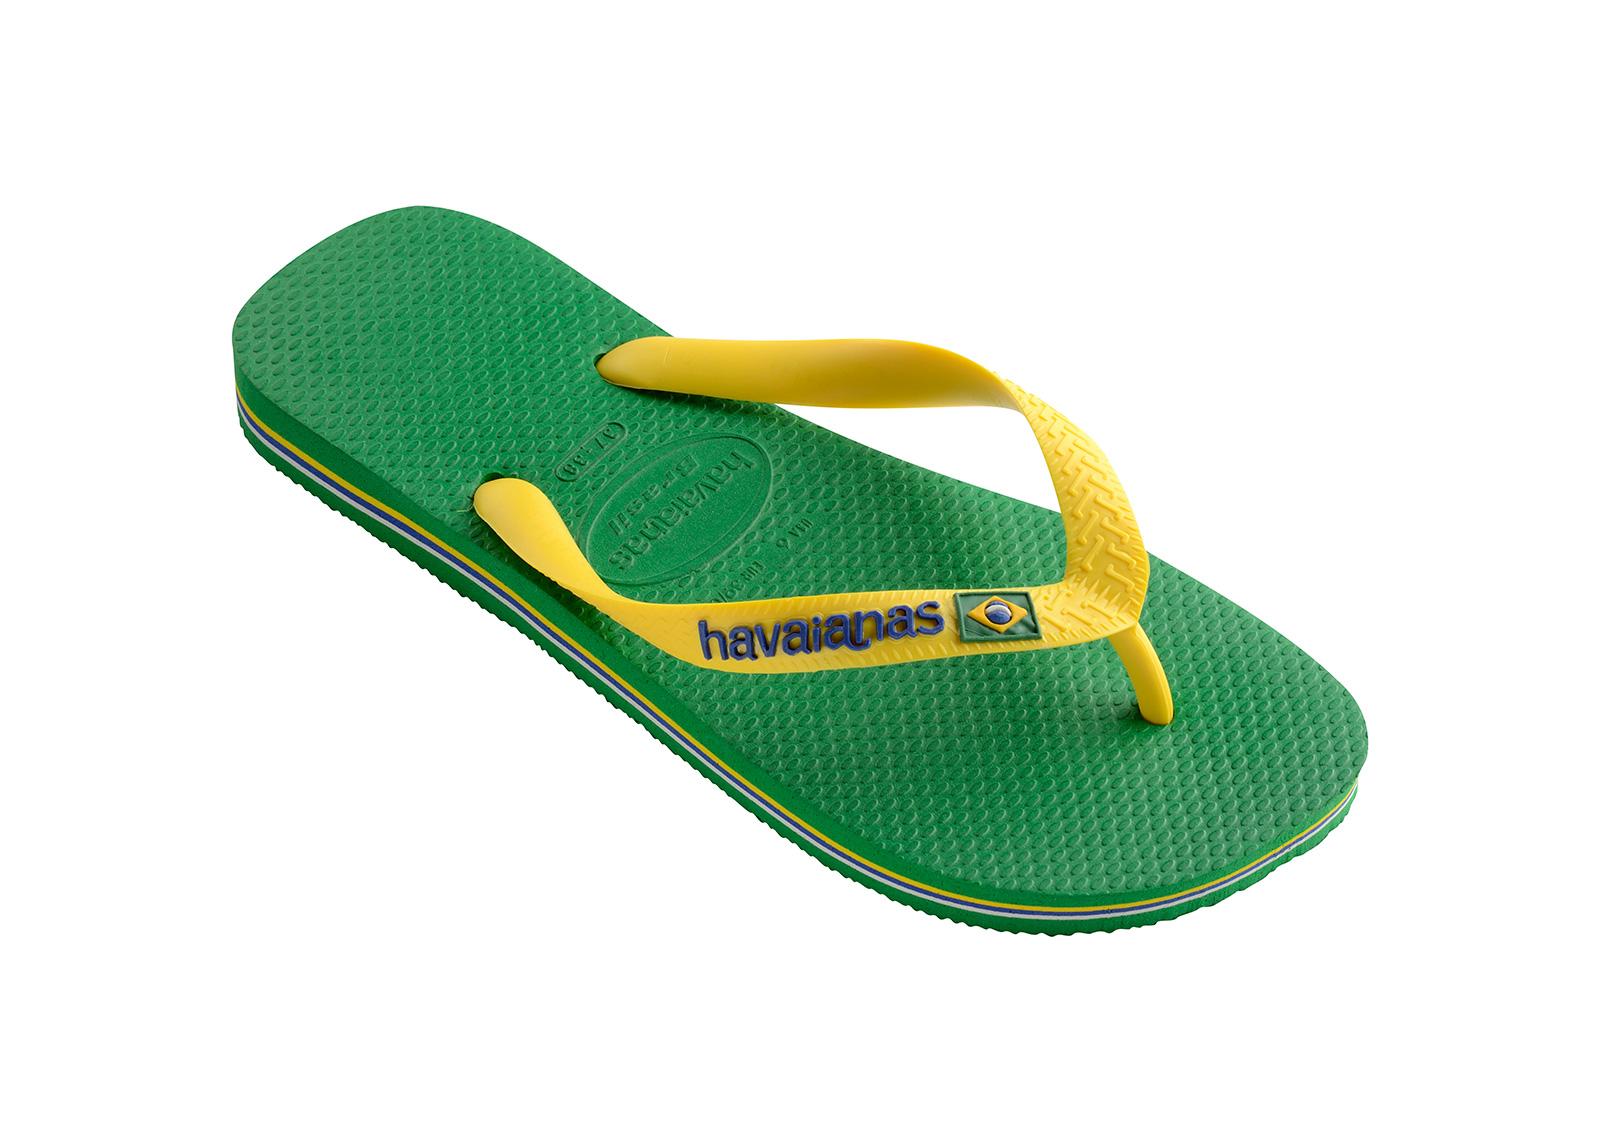 d2903ef565c62 Flip-Flops Flip-flops - Havaianas Brasil Logo Green - Brand Havaianas